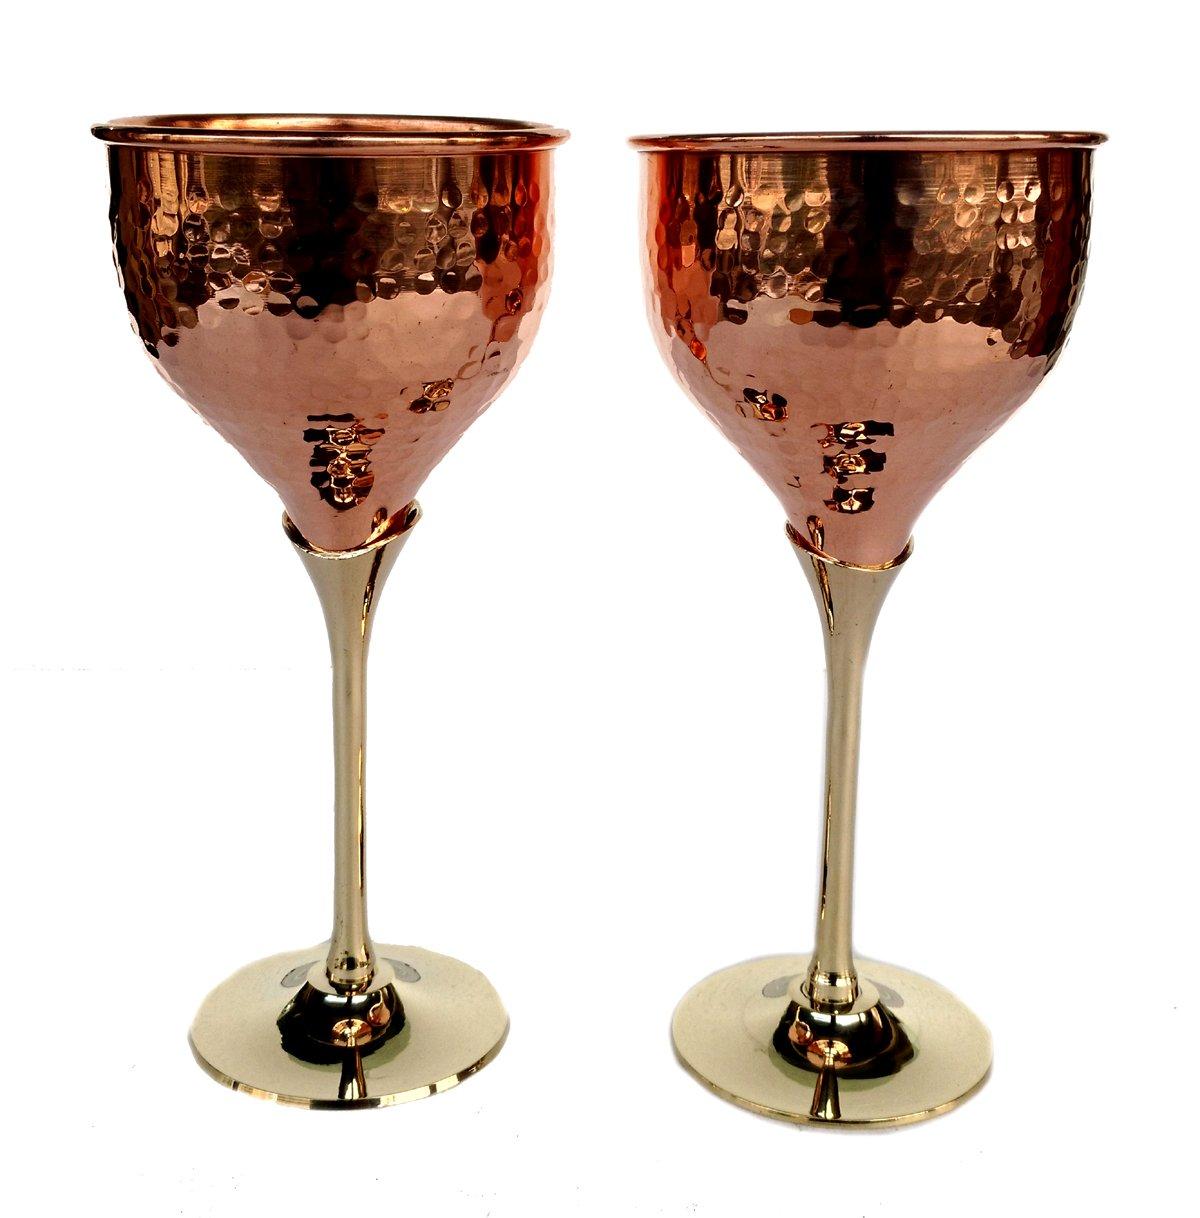 Rastogi Handicrafts Pure Copper Wine Glass Wine Whisky Cocktail Goblet Tableware Bar Hotel Restaurant Serving Set of (2)